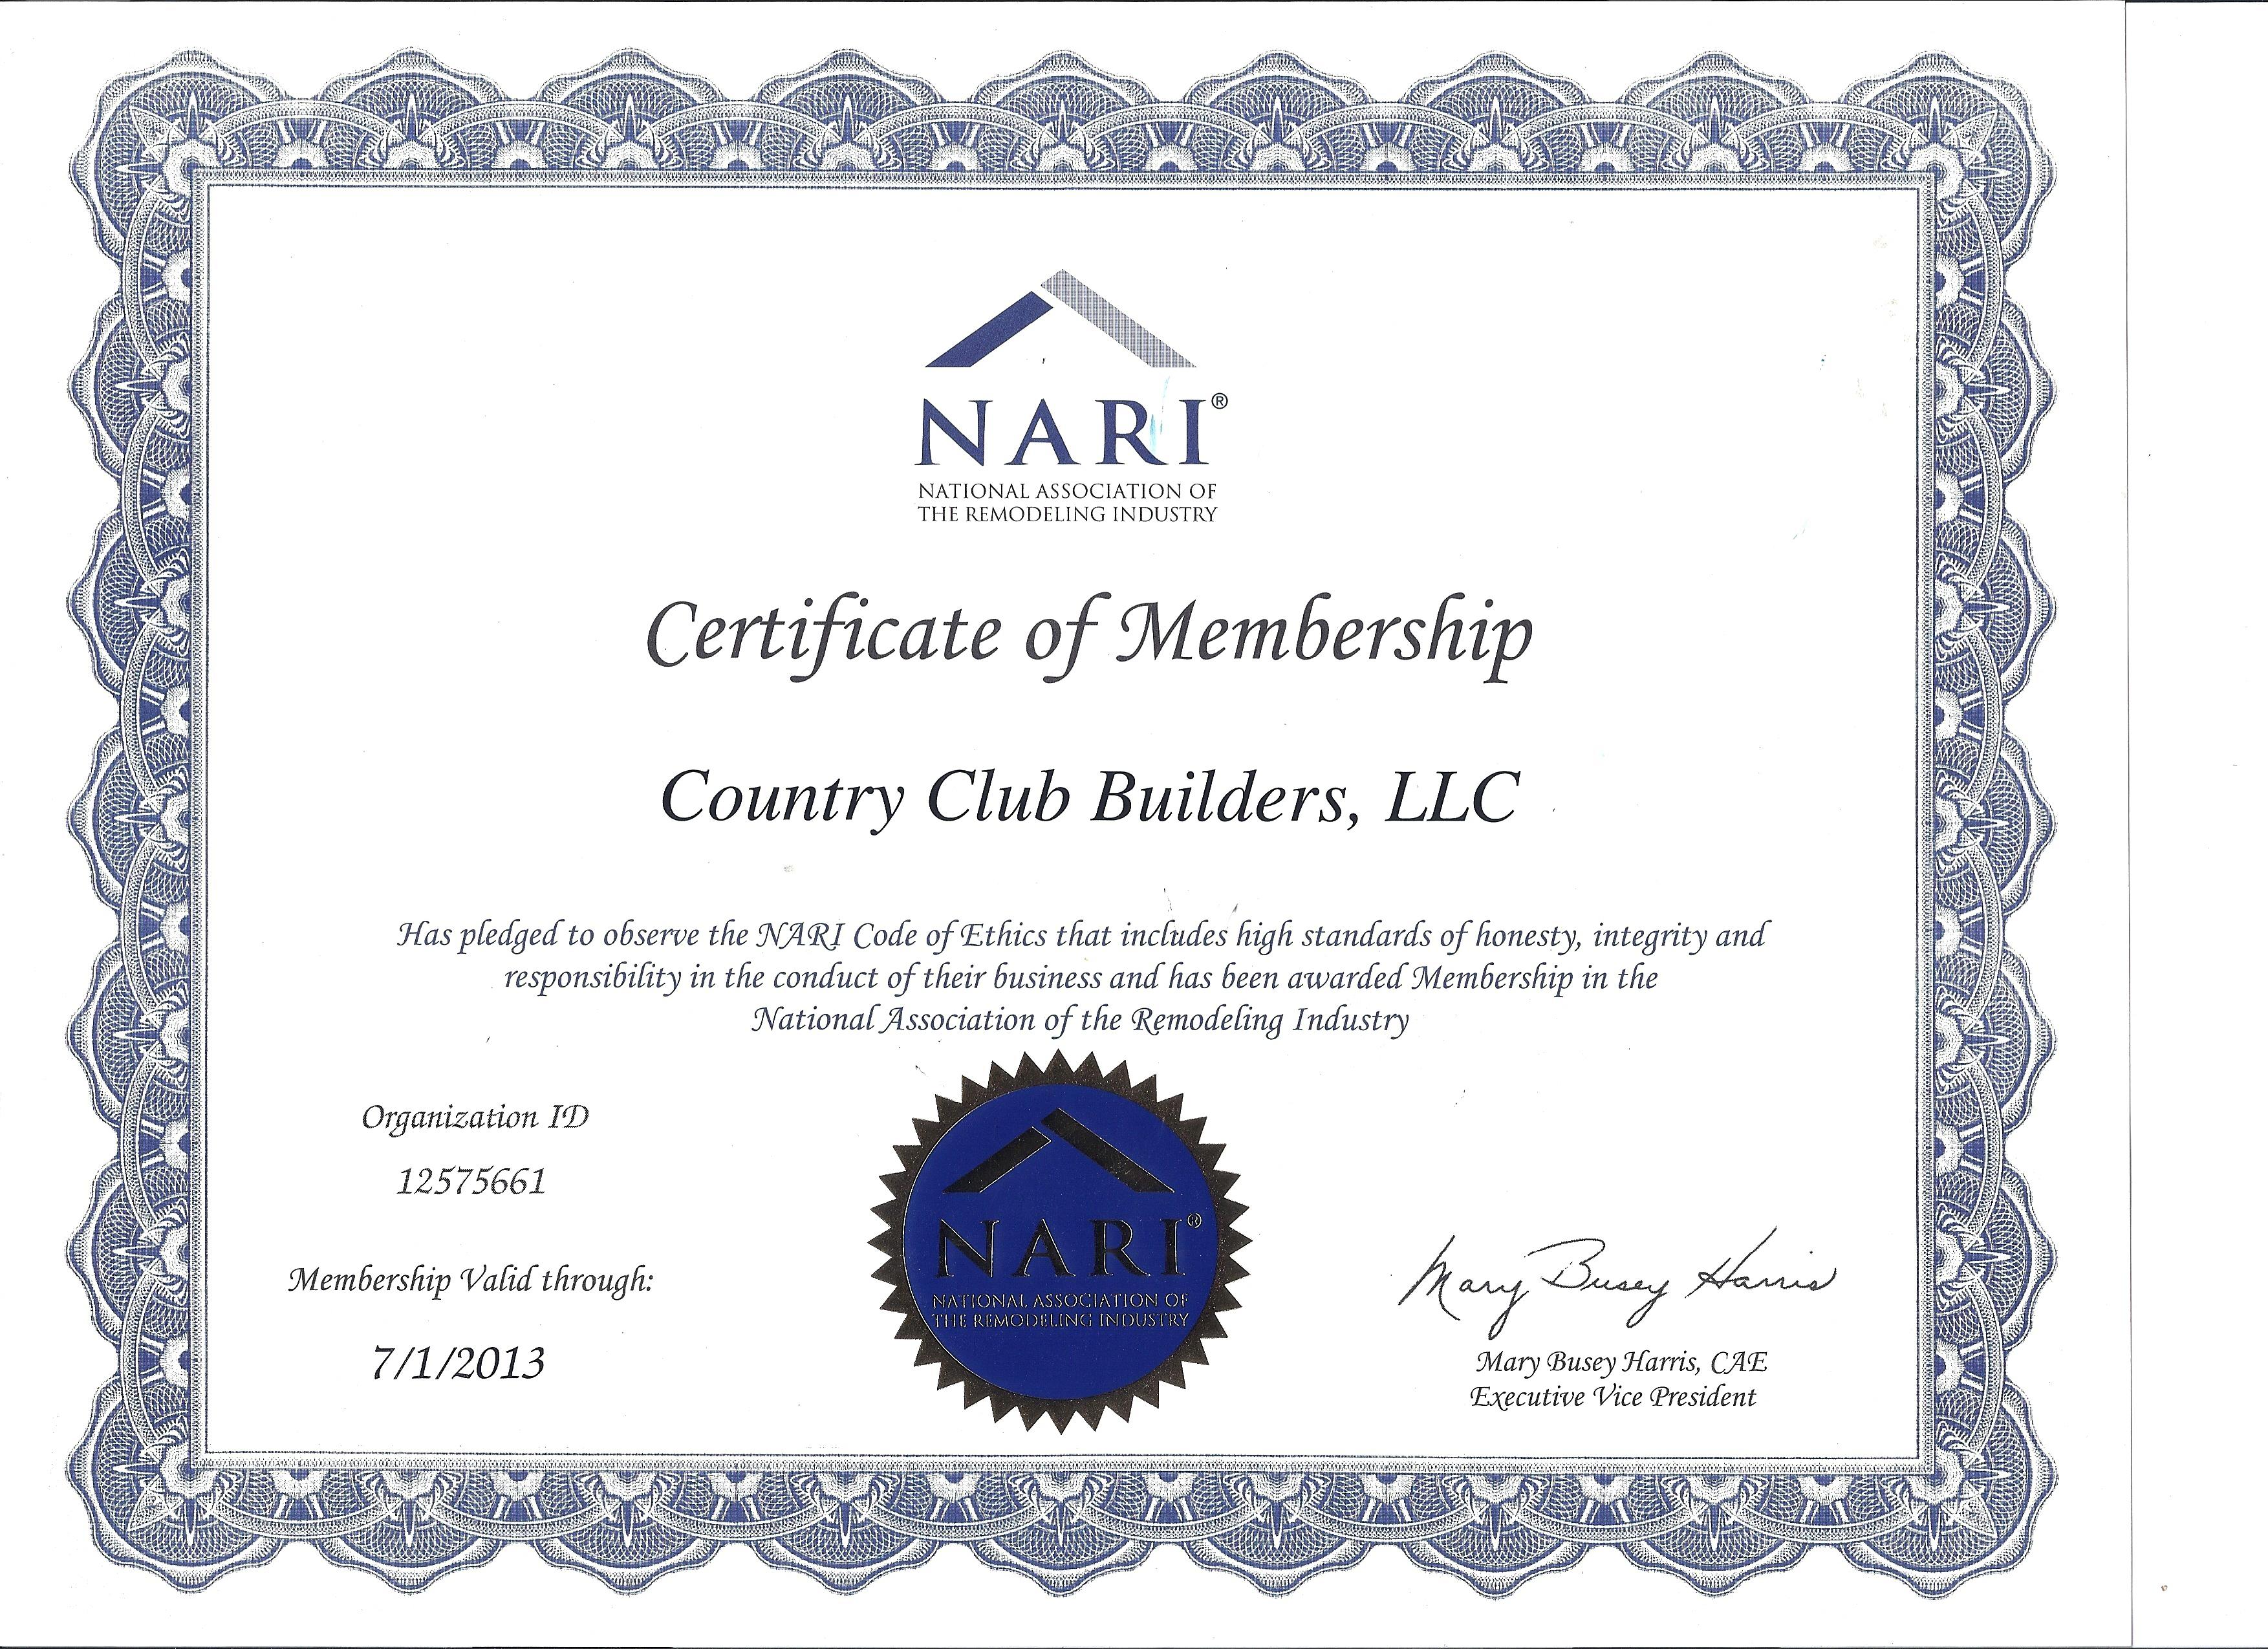 General contractor country club builders nari membership for country club builders xflitez Images